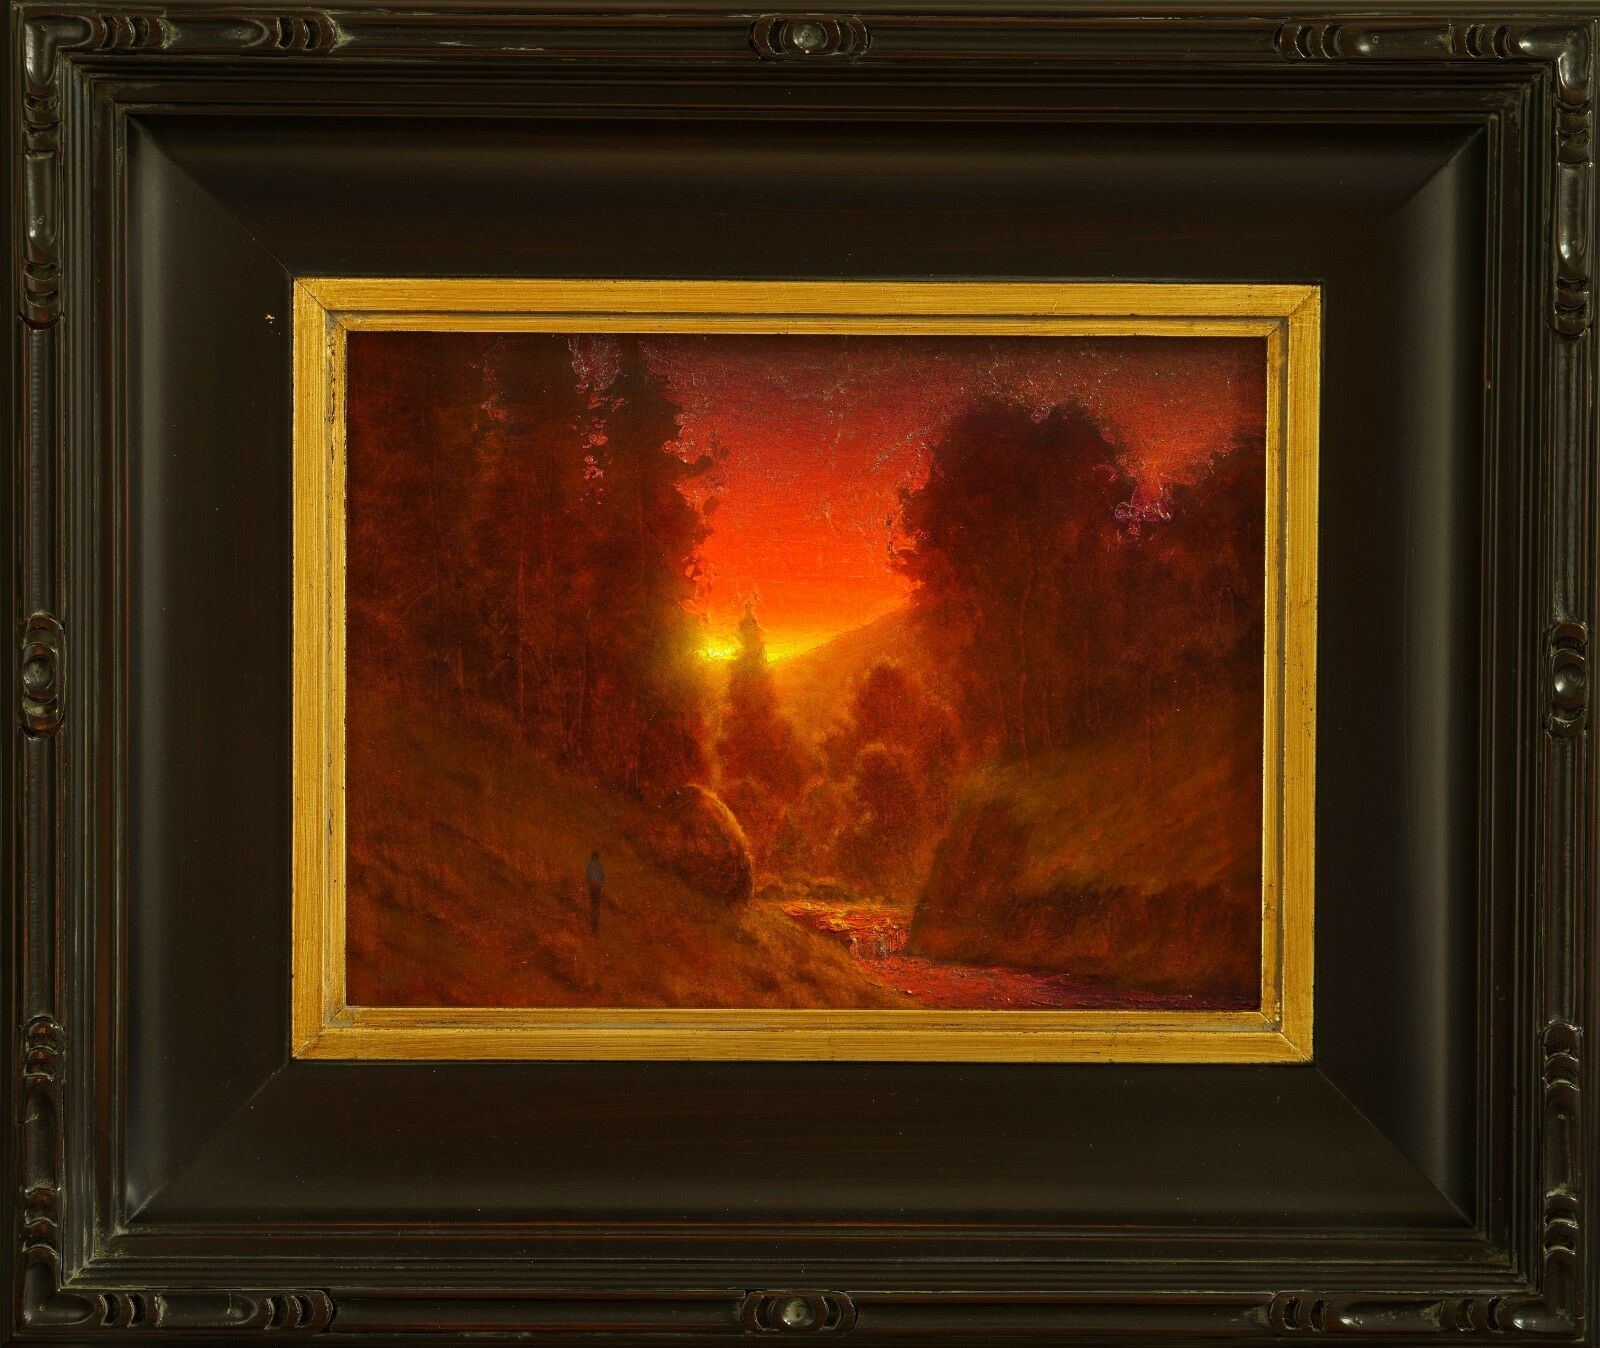 Купить original oil painting landscape signed on canvas vintage antique style 0179 COLE